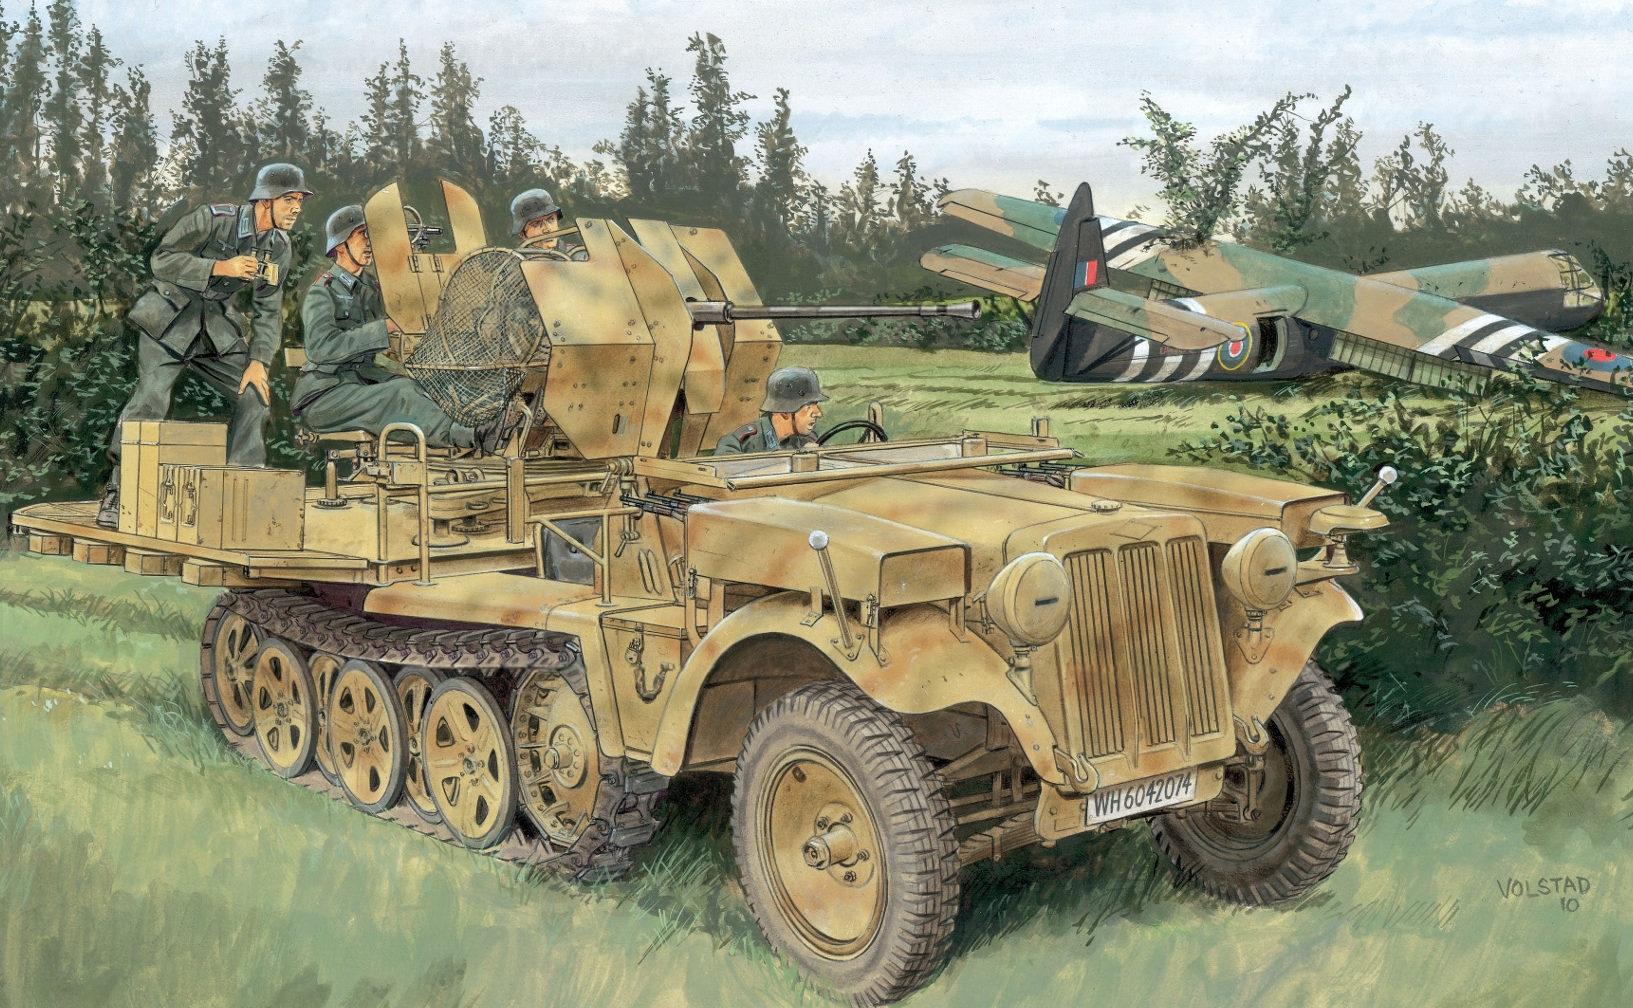 Volstad Ronald. CАУ Sd.Kfz. 10/5 с пушкой Flak 38.